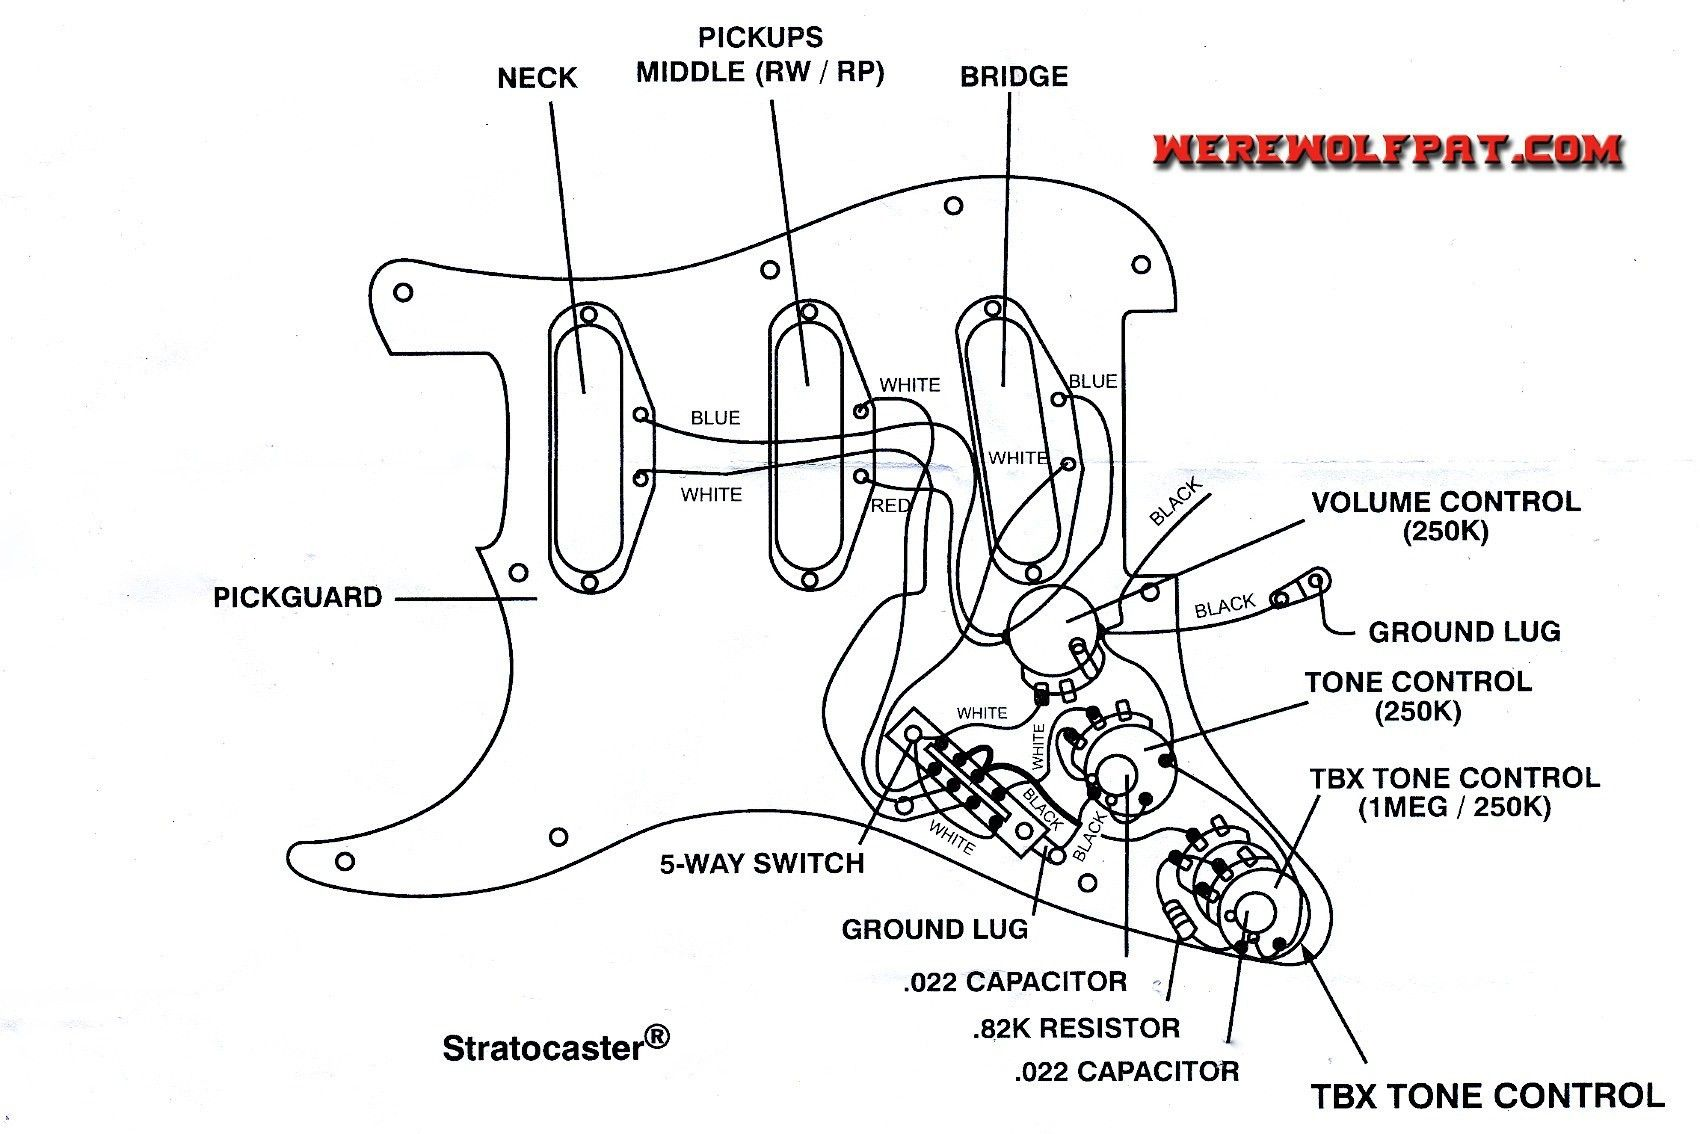 Schecter Diamond Series Wiring Diagram Inspirational Les Paul Fender American Standard New Books